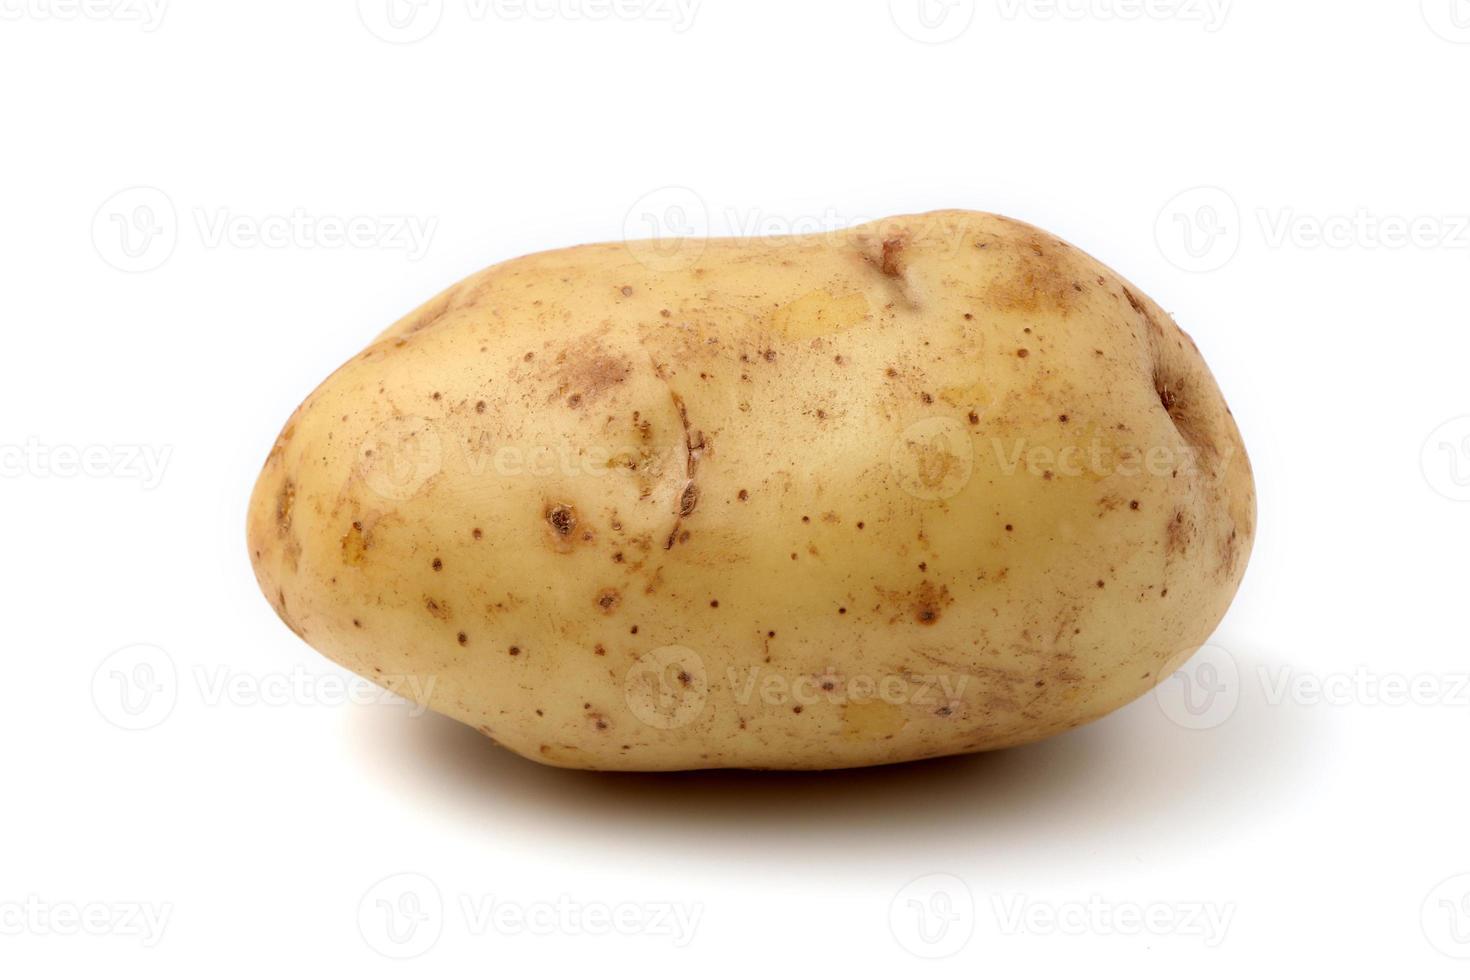 Raw Potatoes 9 photo